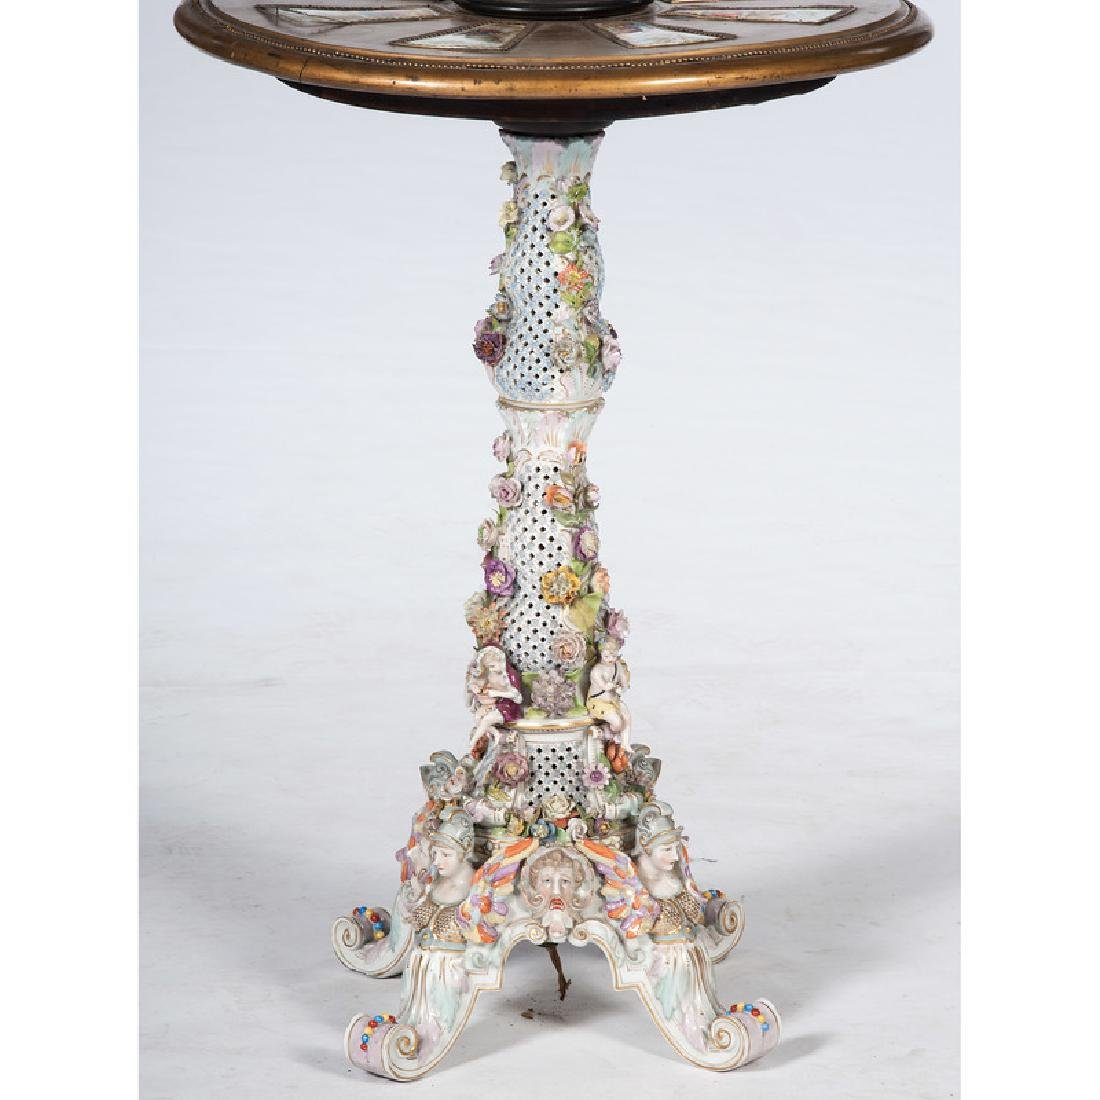 Carl Thieme Porcelain Floor Lamp - 4